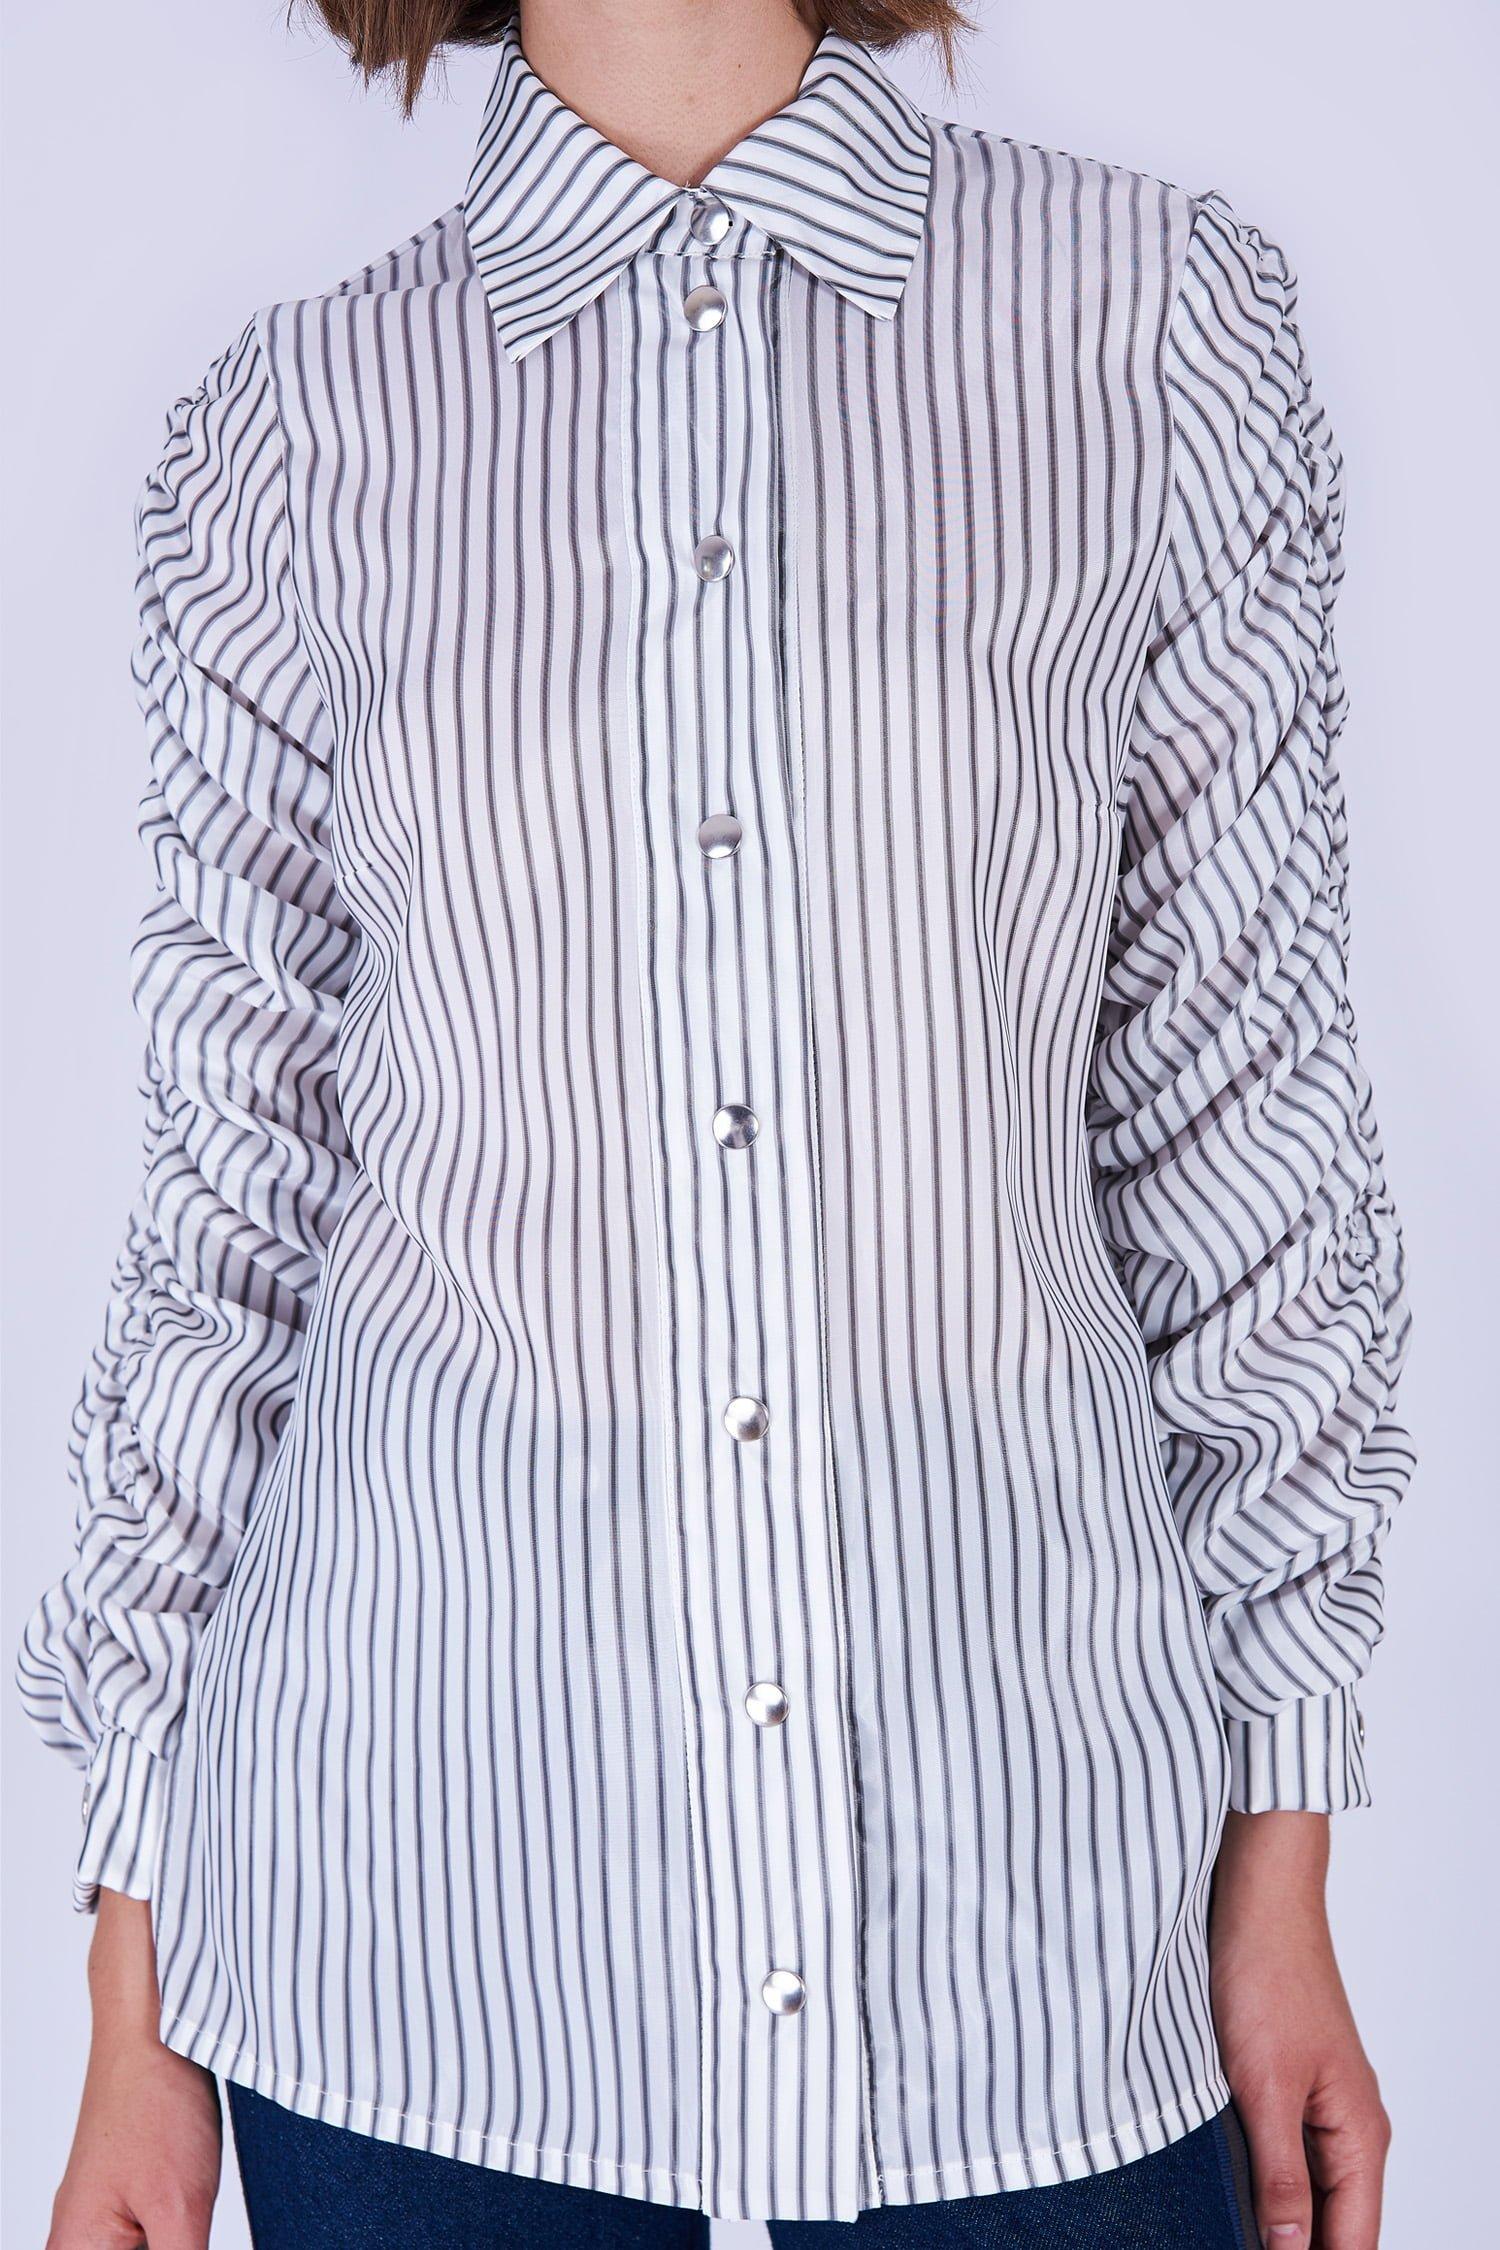 Acephala Fw19 20 White Striped Buttoned Shirt Biala Koszula Paski Detail 2